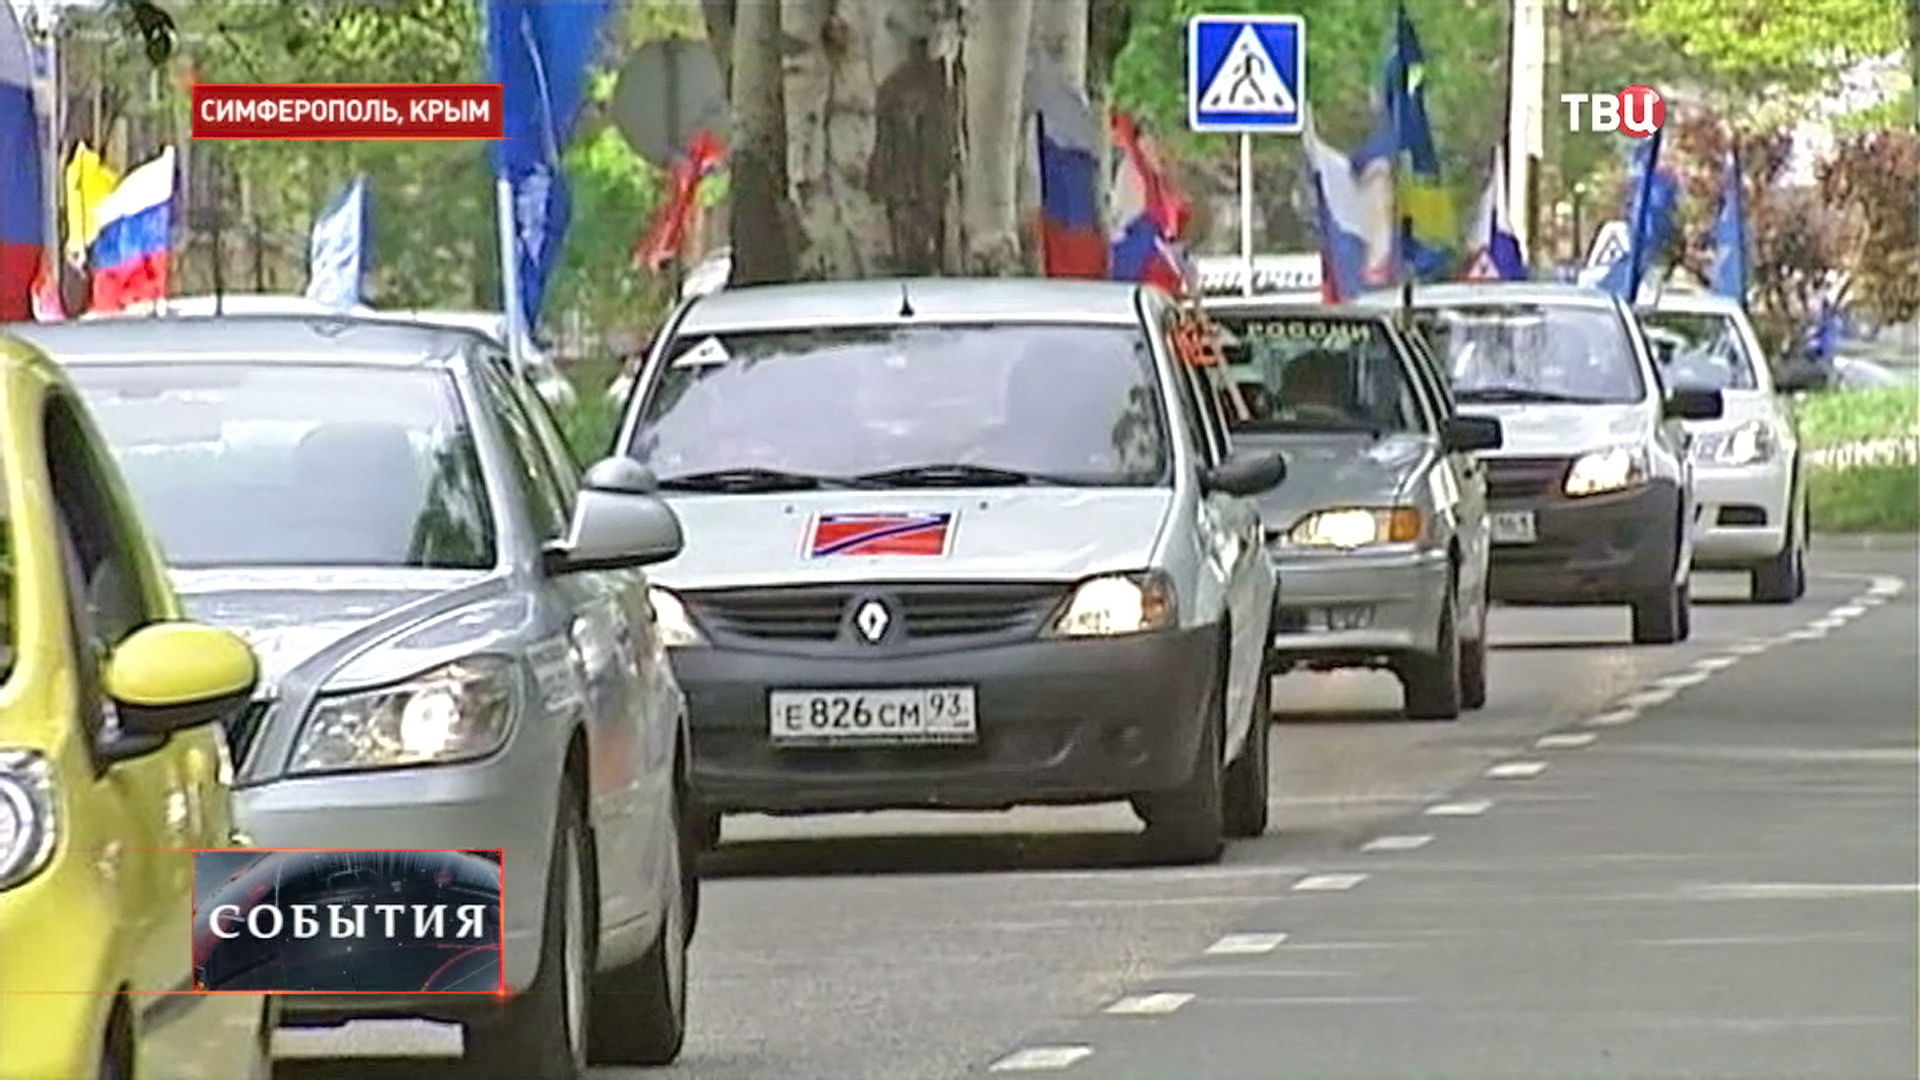 Автопробег в Симферополе